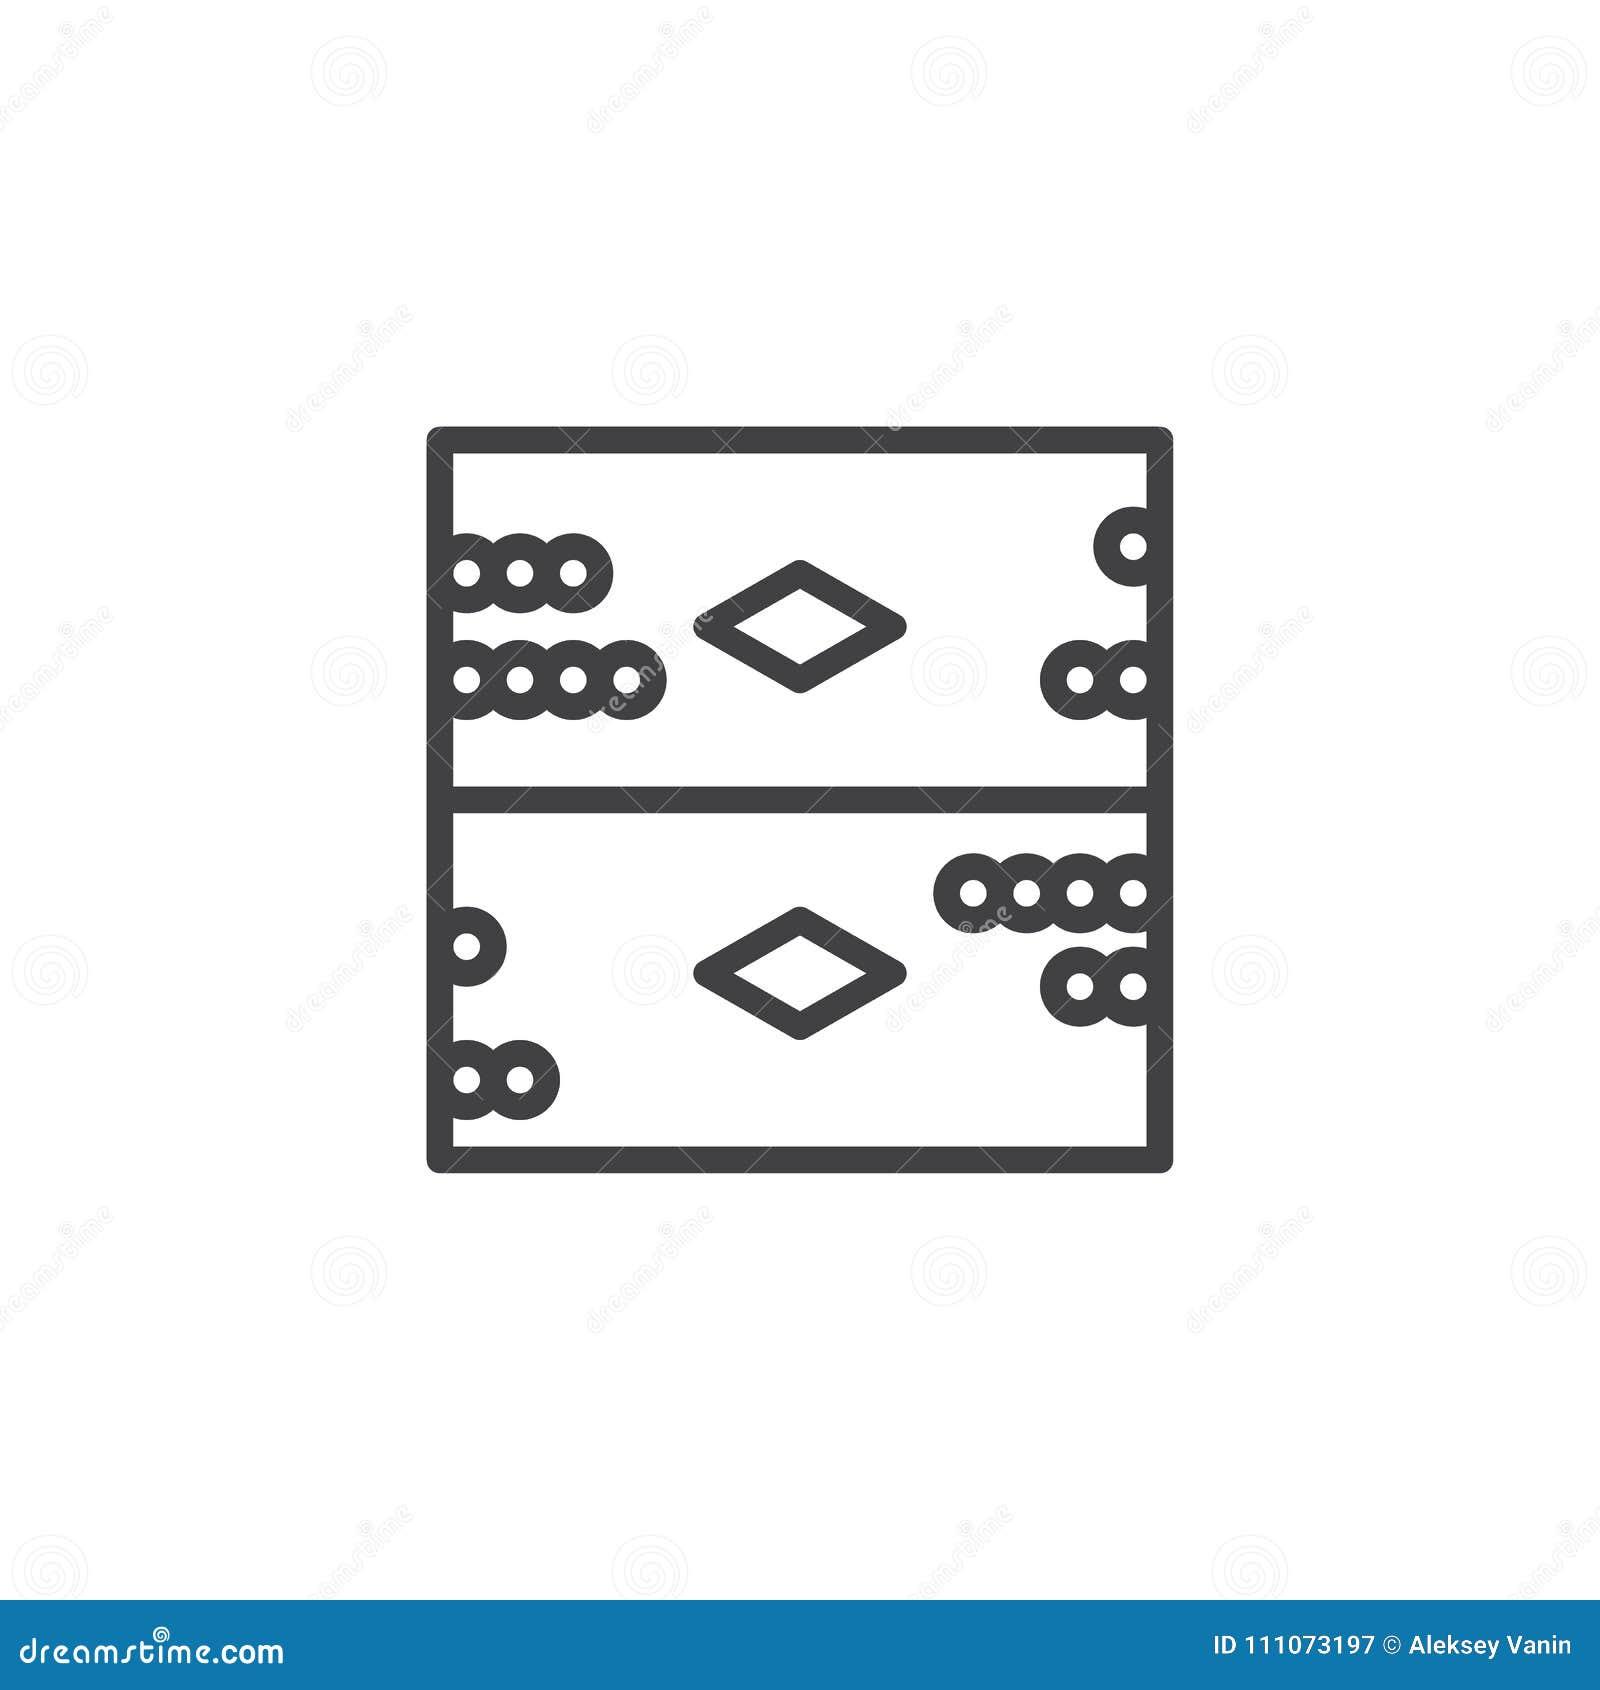 Backgammon Board Game Outline Icon Stock Vector Illustration Of - Game outline